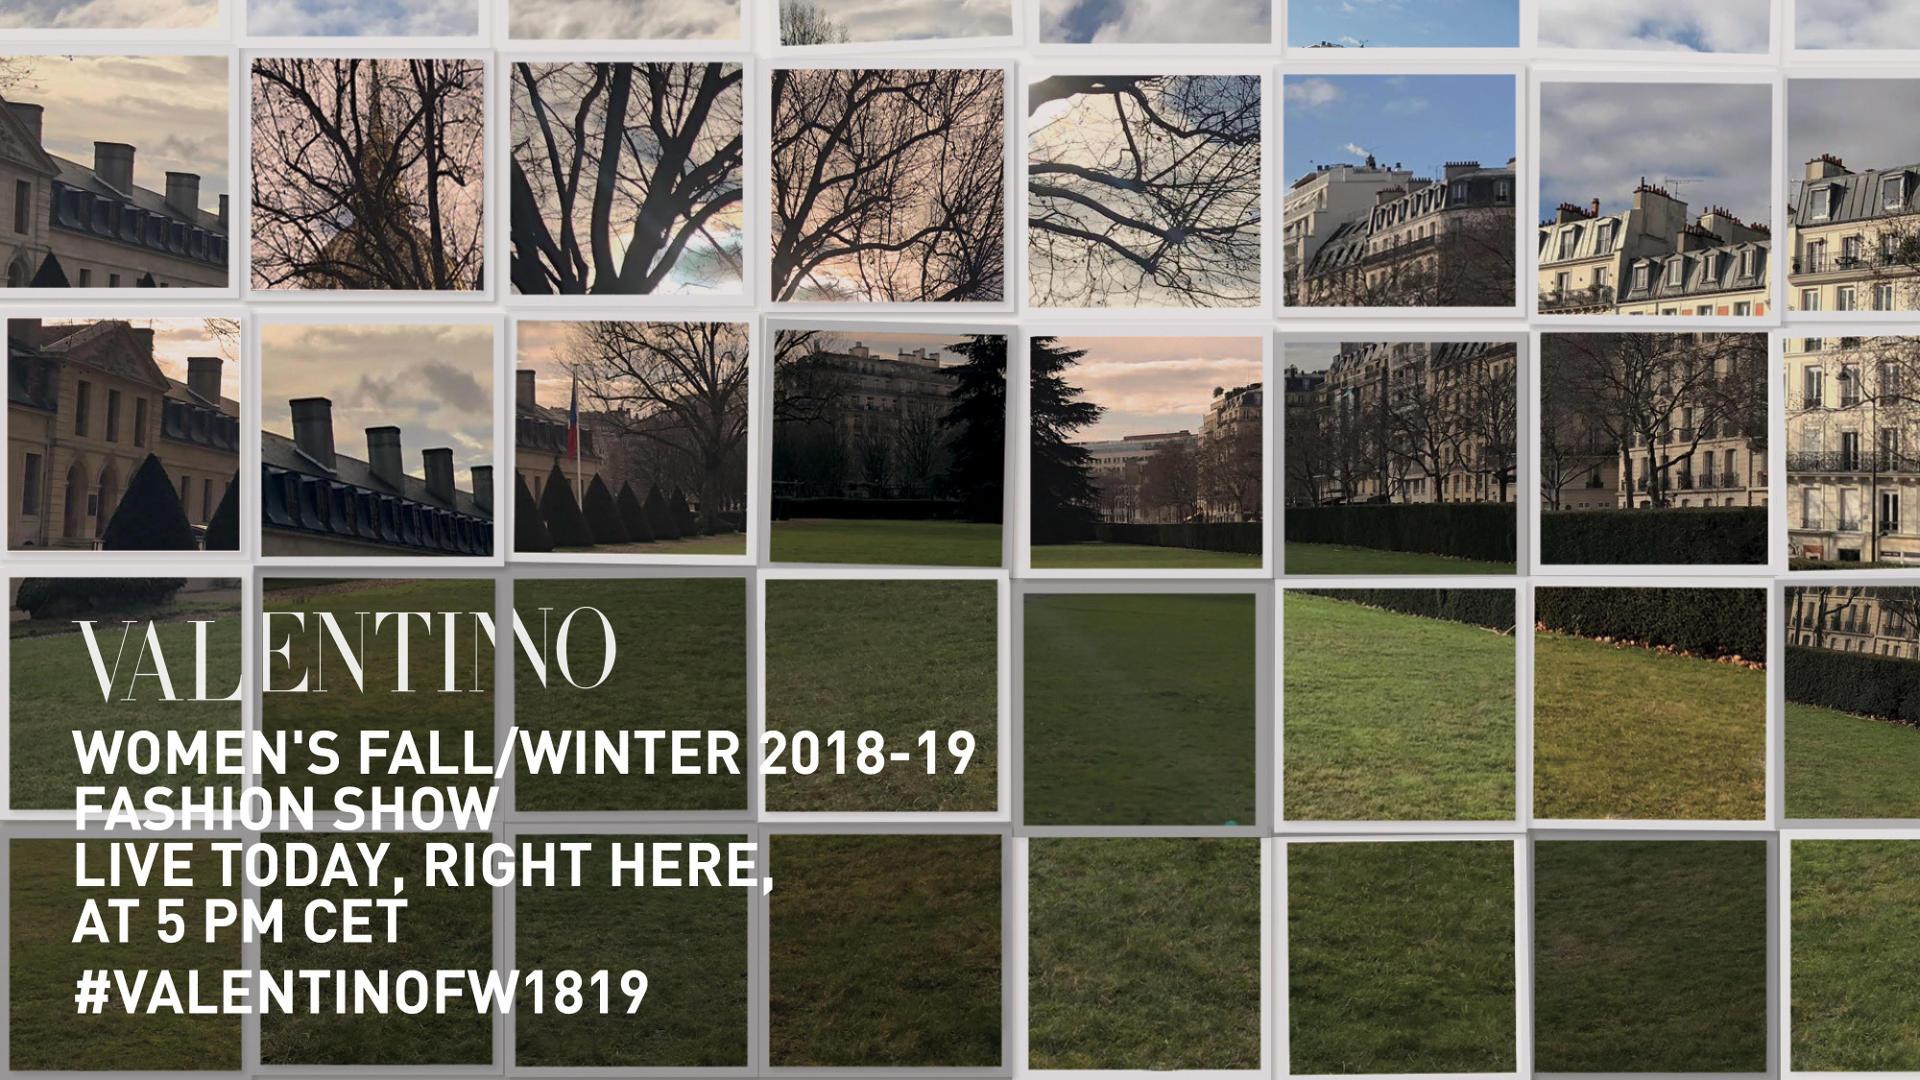 Valentino Fall Winter 2018 Women's Fashion Show Live Streaming